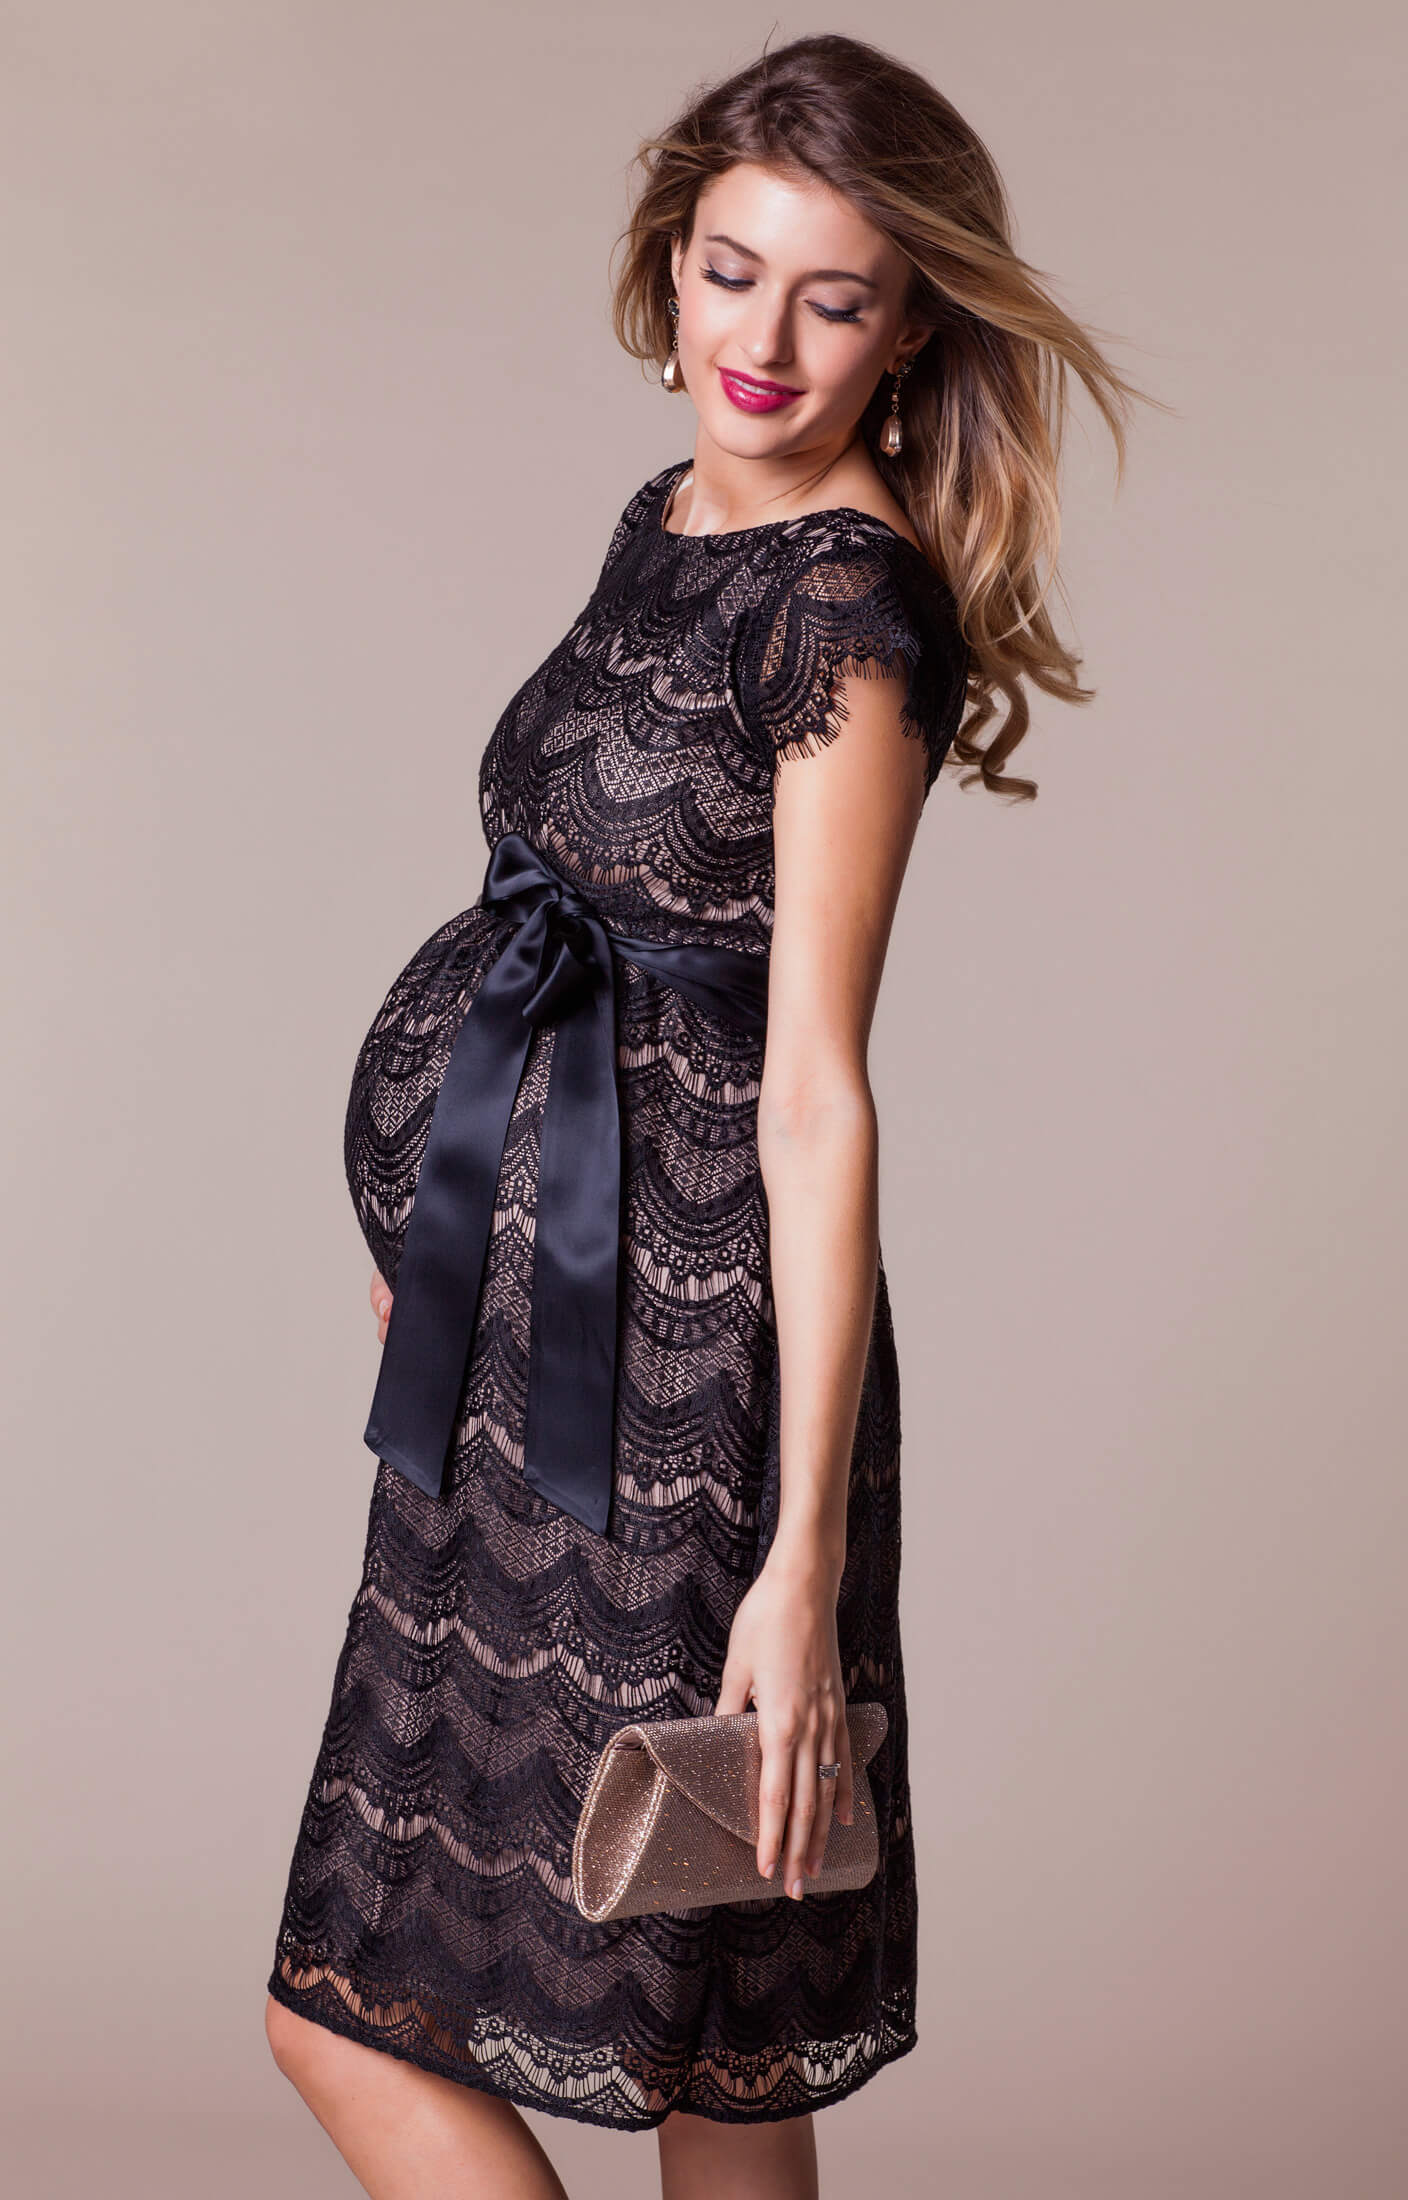 Harriet Maternity Dress Short BlackDusk  Maternity Wedding Dresses Evening Wear and Party